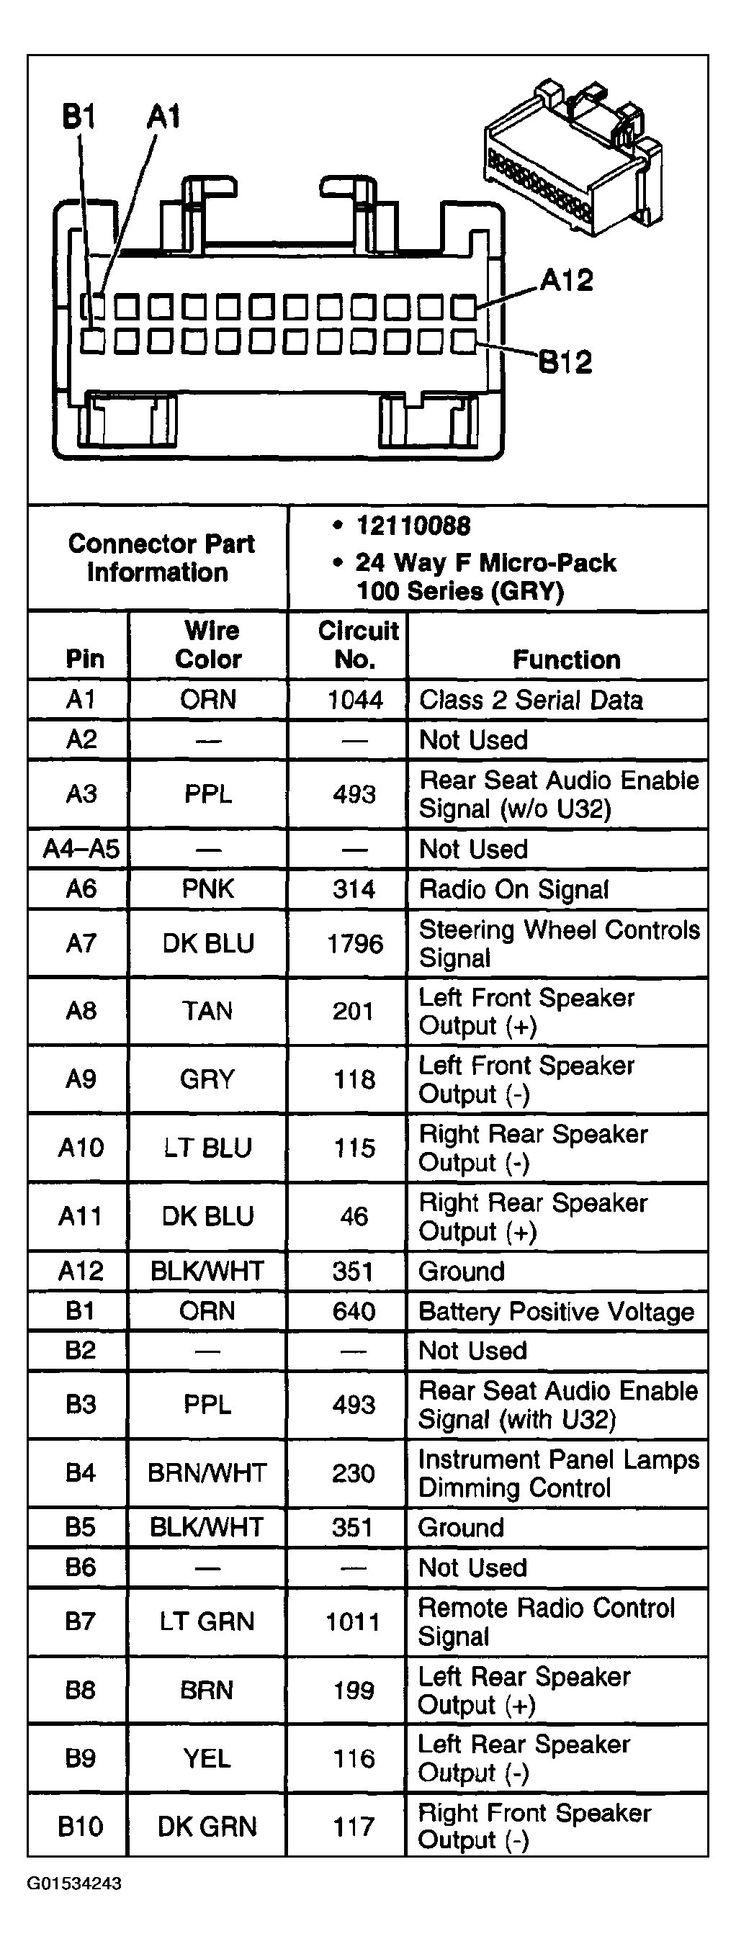 05 trailblazer radio wire diagrams in 2021   chevy trailblazer, radio, chevrolet  trailblazer  pinterest